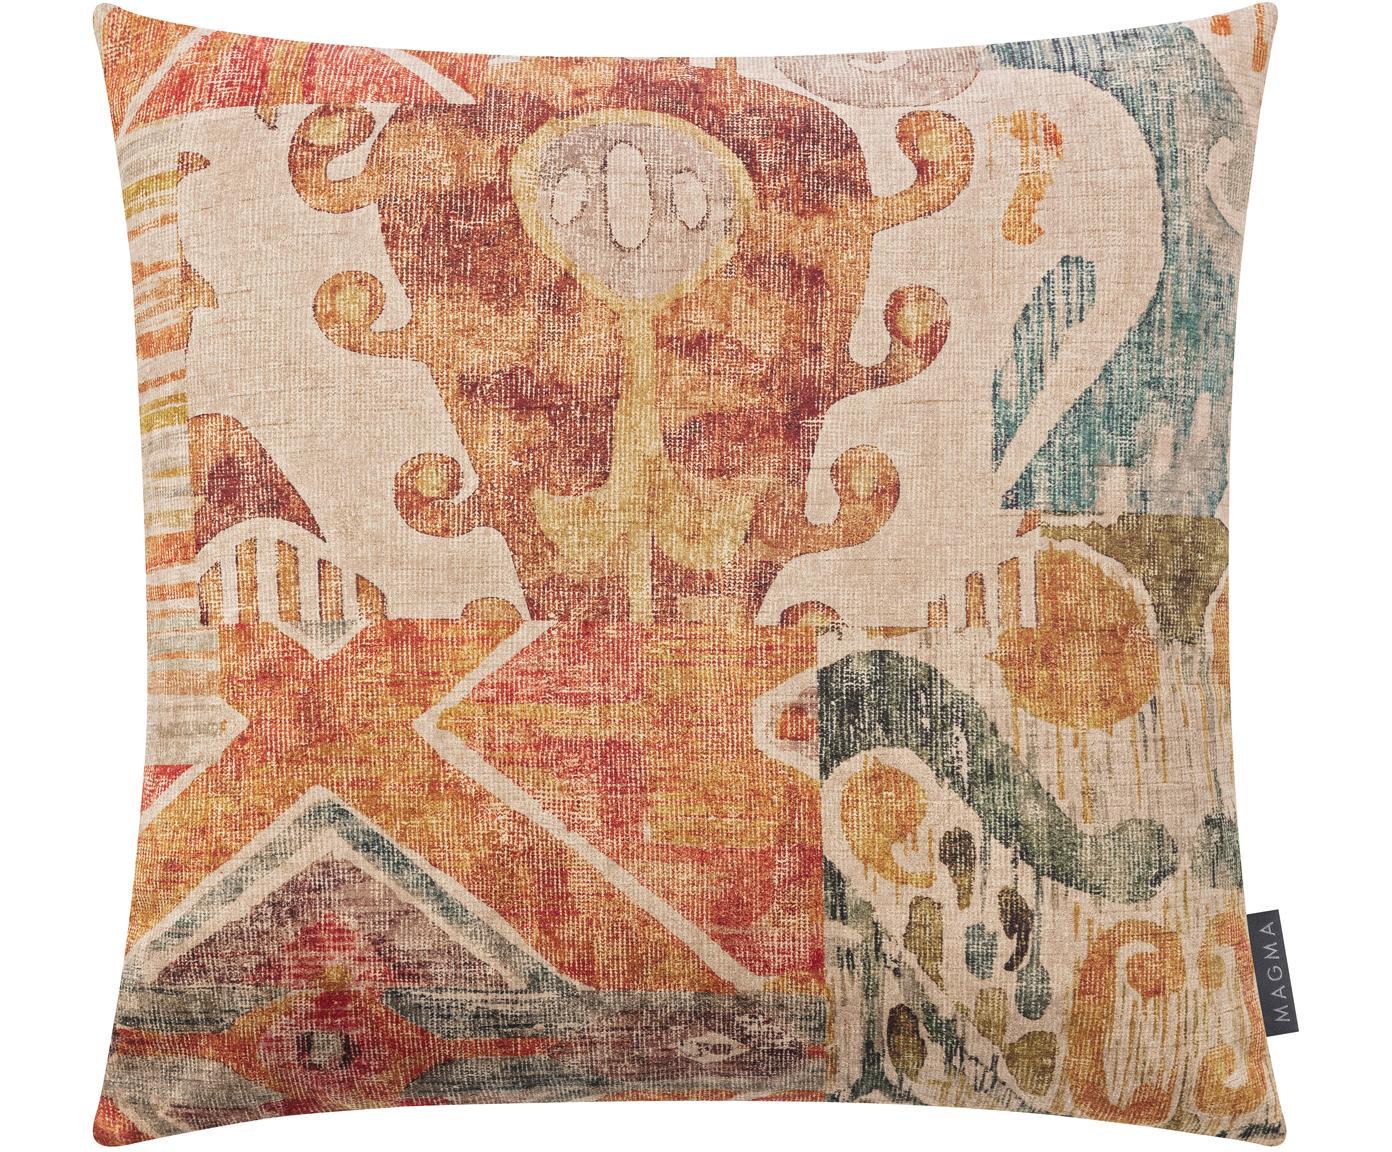 Samt-Kissenhülle Cosima mit buntem Ethno-Muster, 100% Polyestersamt, Orange, Mehrfarbig, 50 x 50 cm